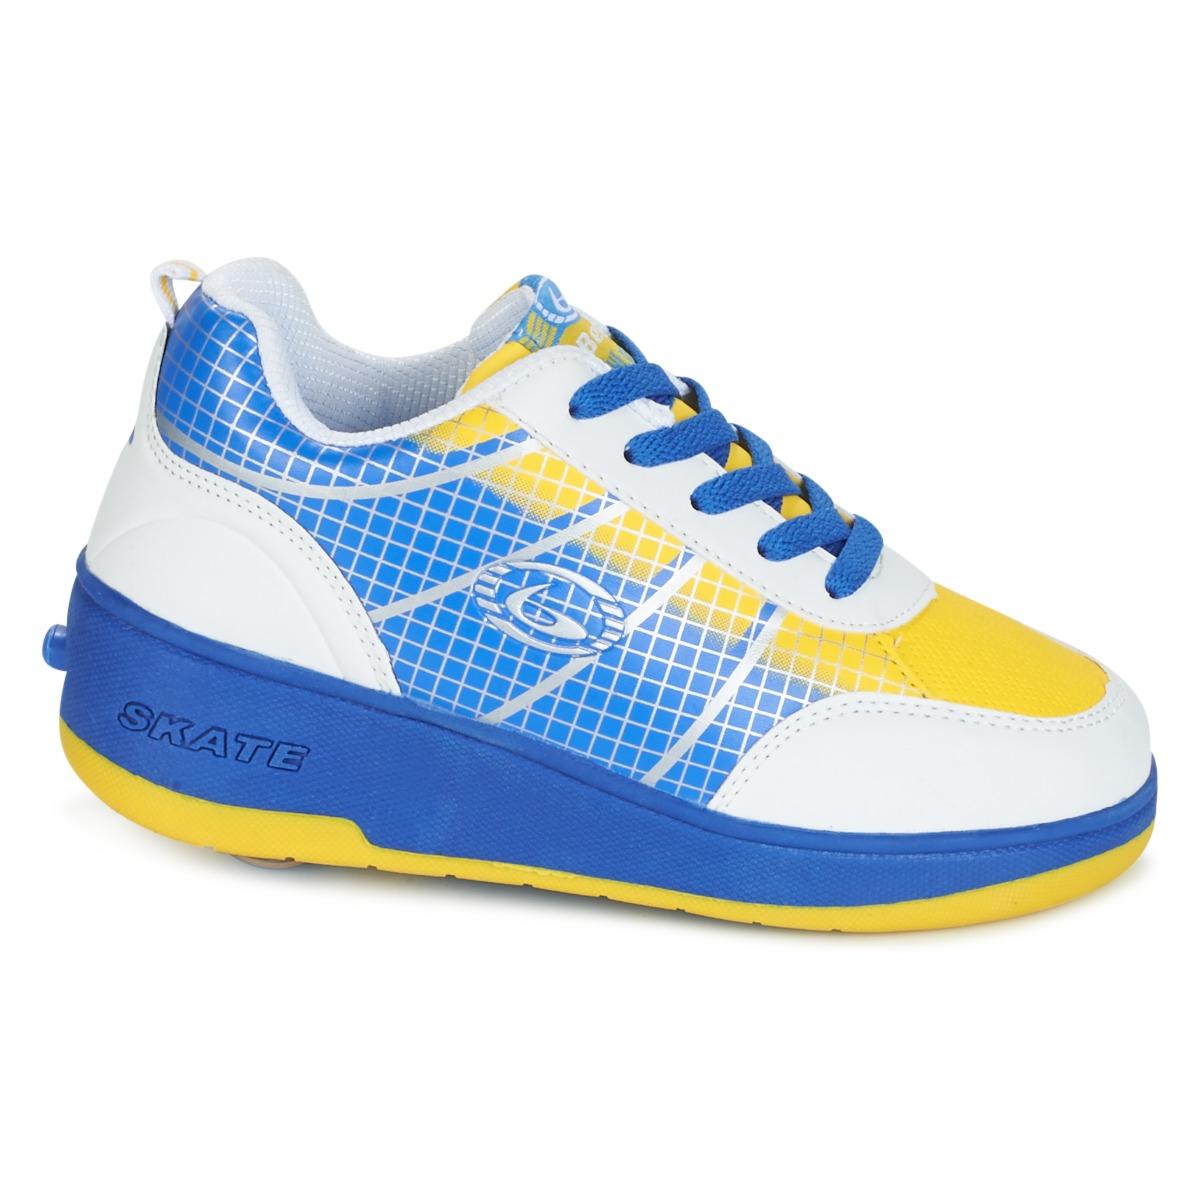 d0ec22b6095 BEPPI LOVINO BRONZE Shoes Low top trainers Child 70%OFF - filmorama.si